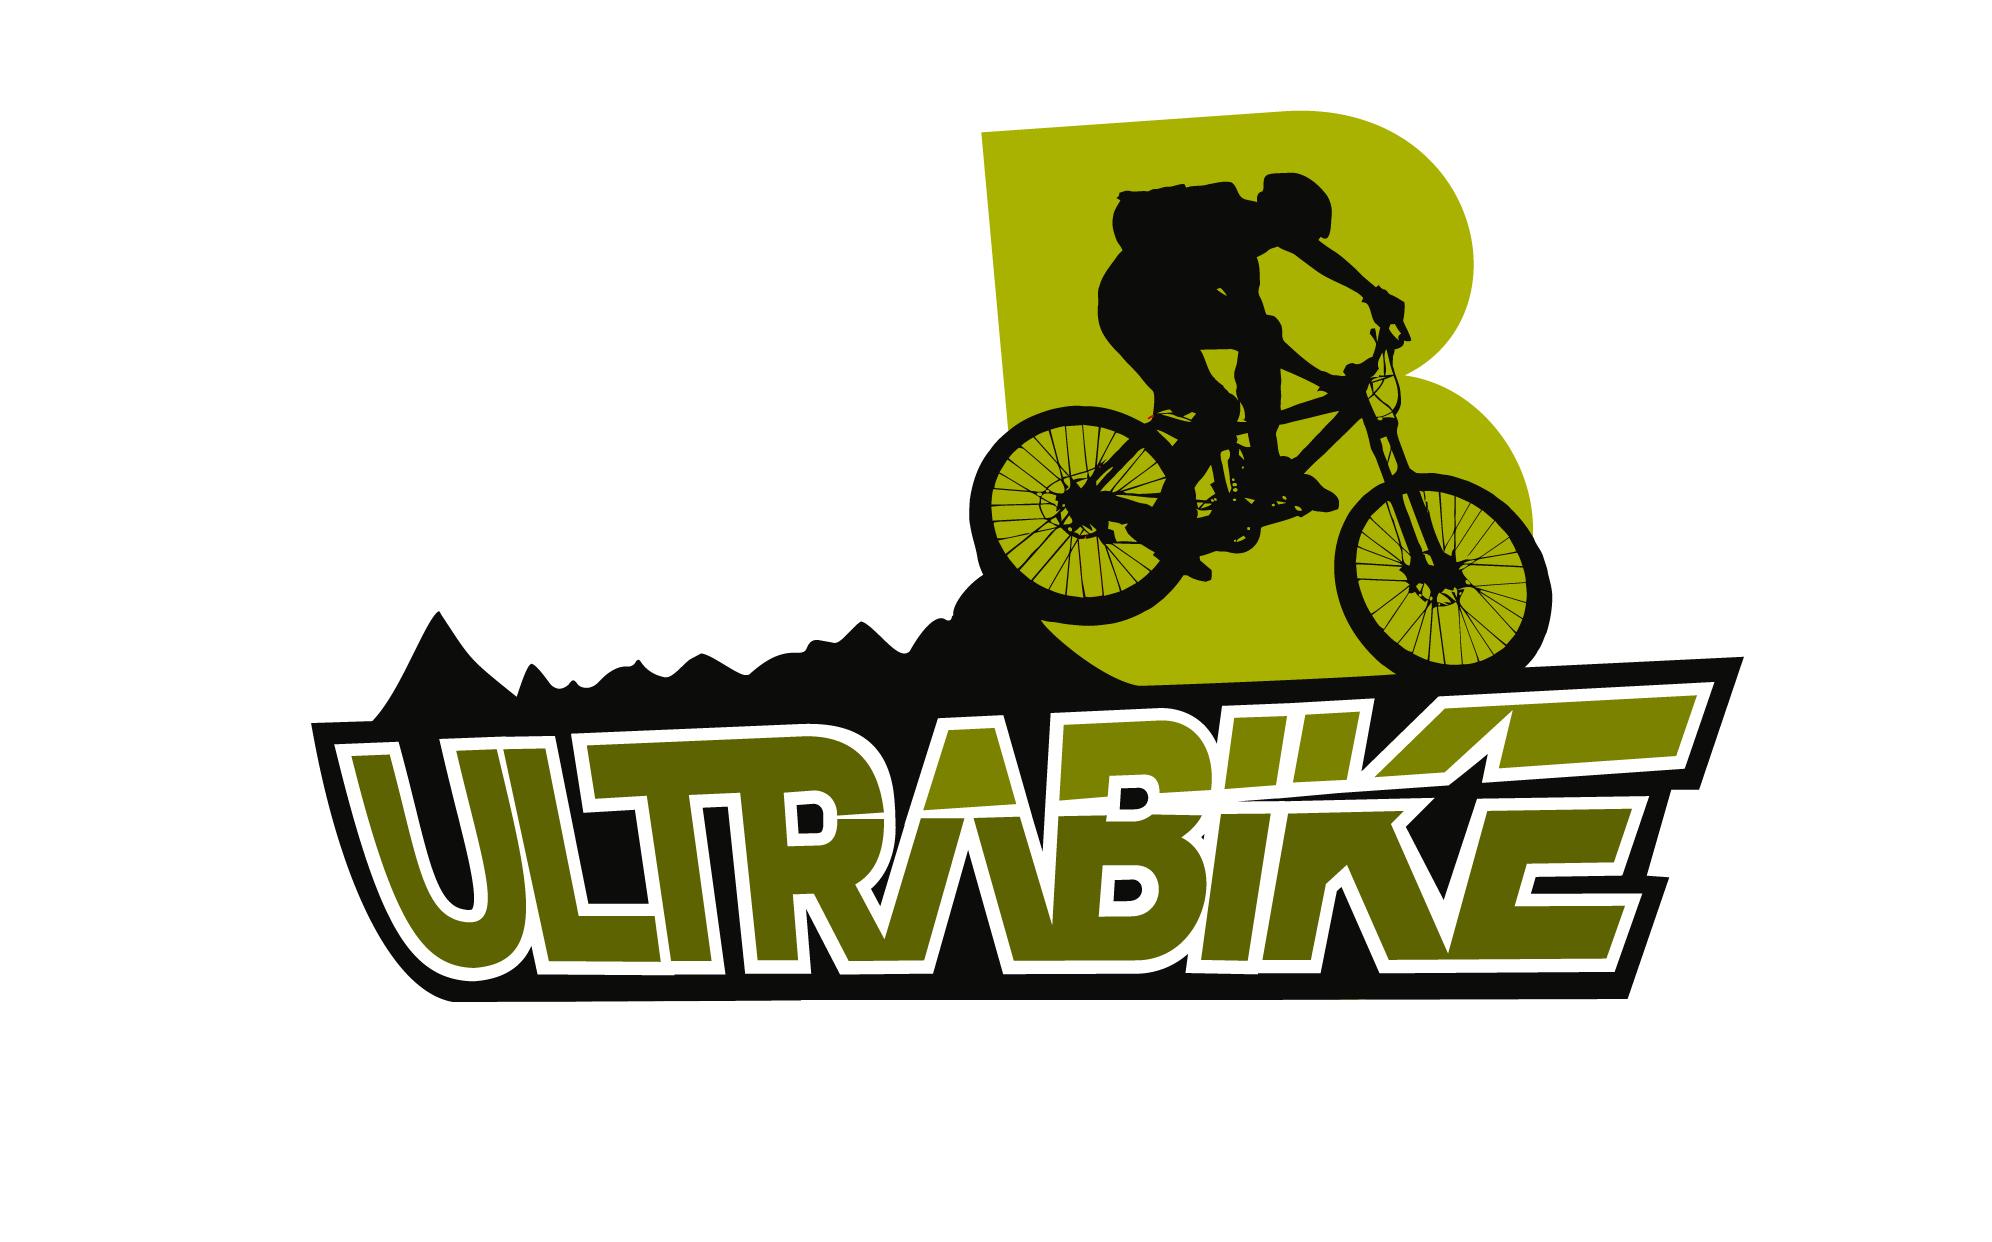 ULTRABIKE 2021 - Inscríbete